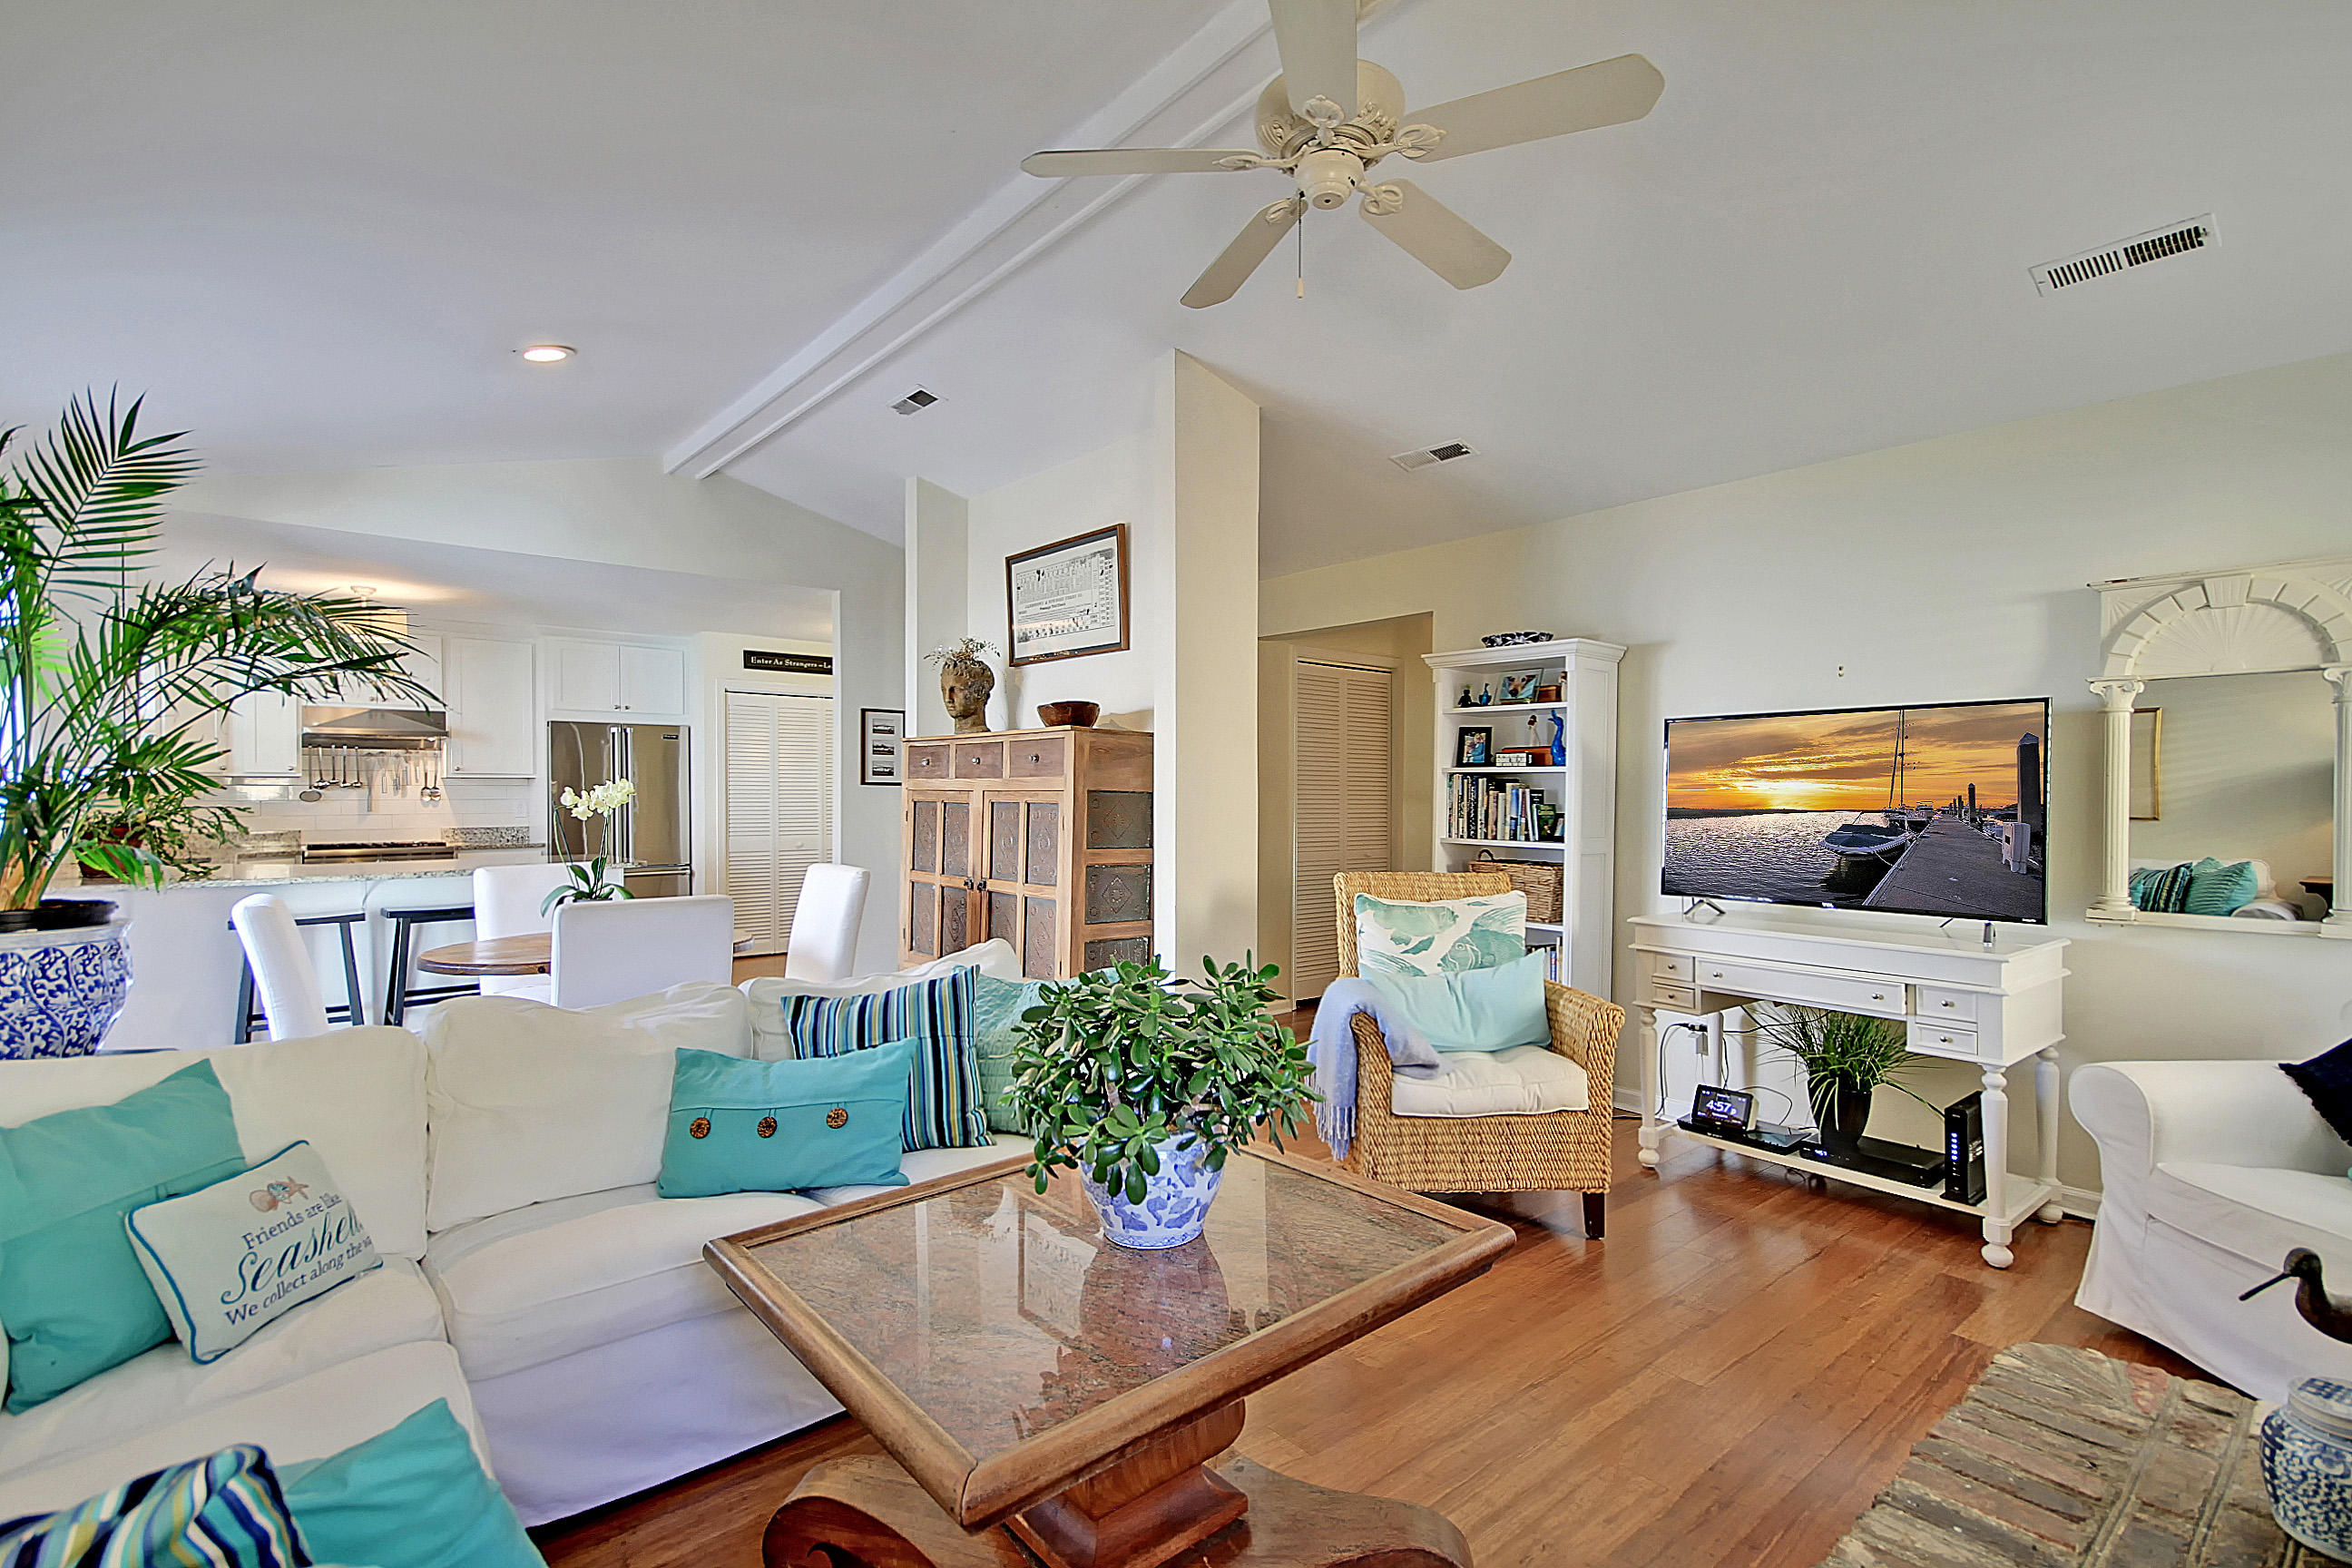 Pirates Cove Homes For Sale - 1492 Ketch, Mount Pleasant, SC - 0